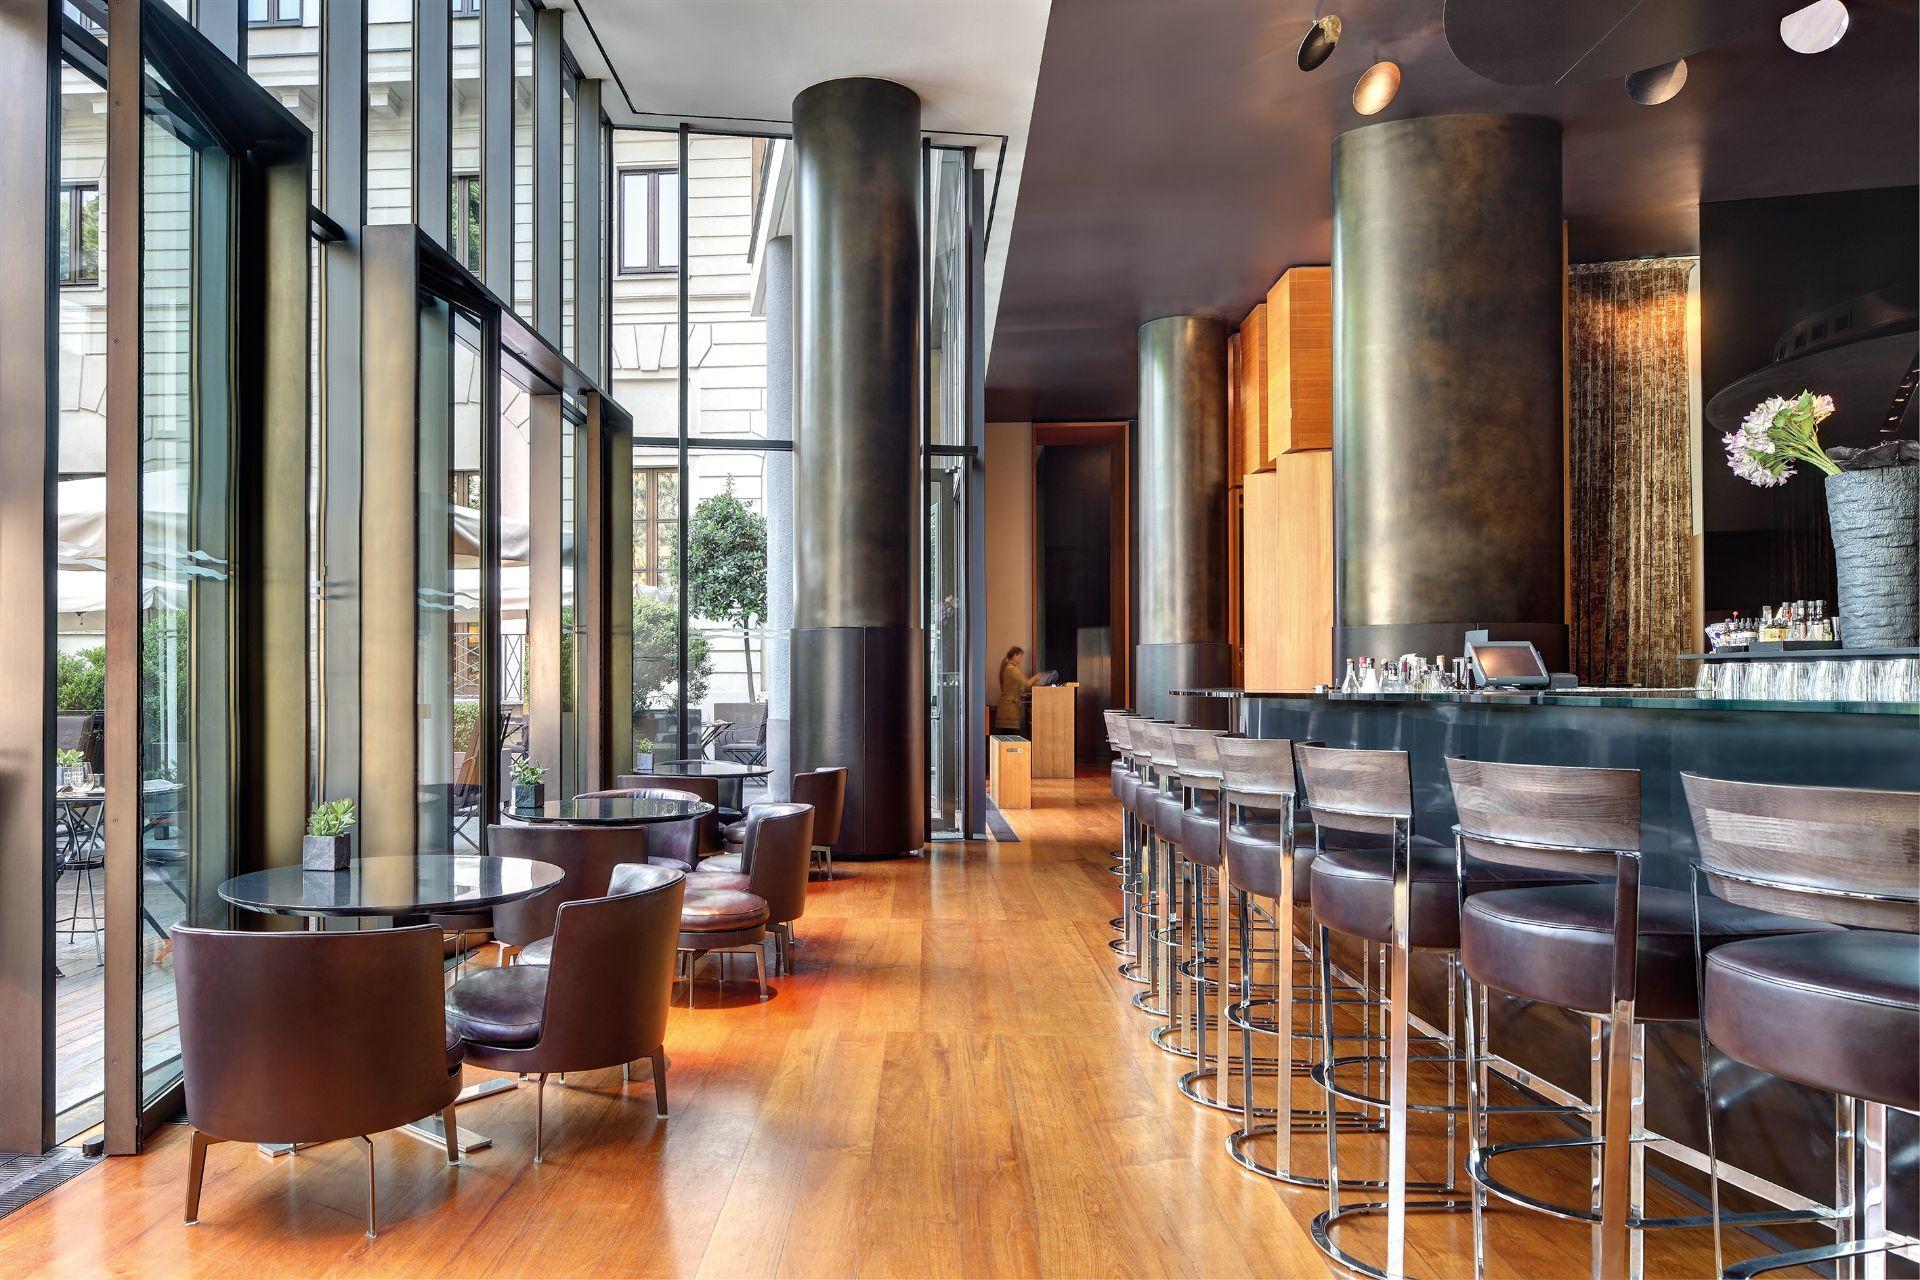 Bulgari Hotel Milano Luxury Bar For The Best Aperitivo In